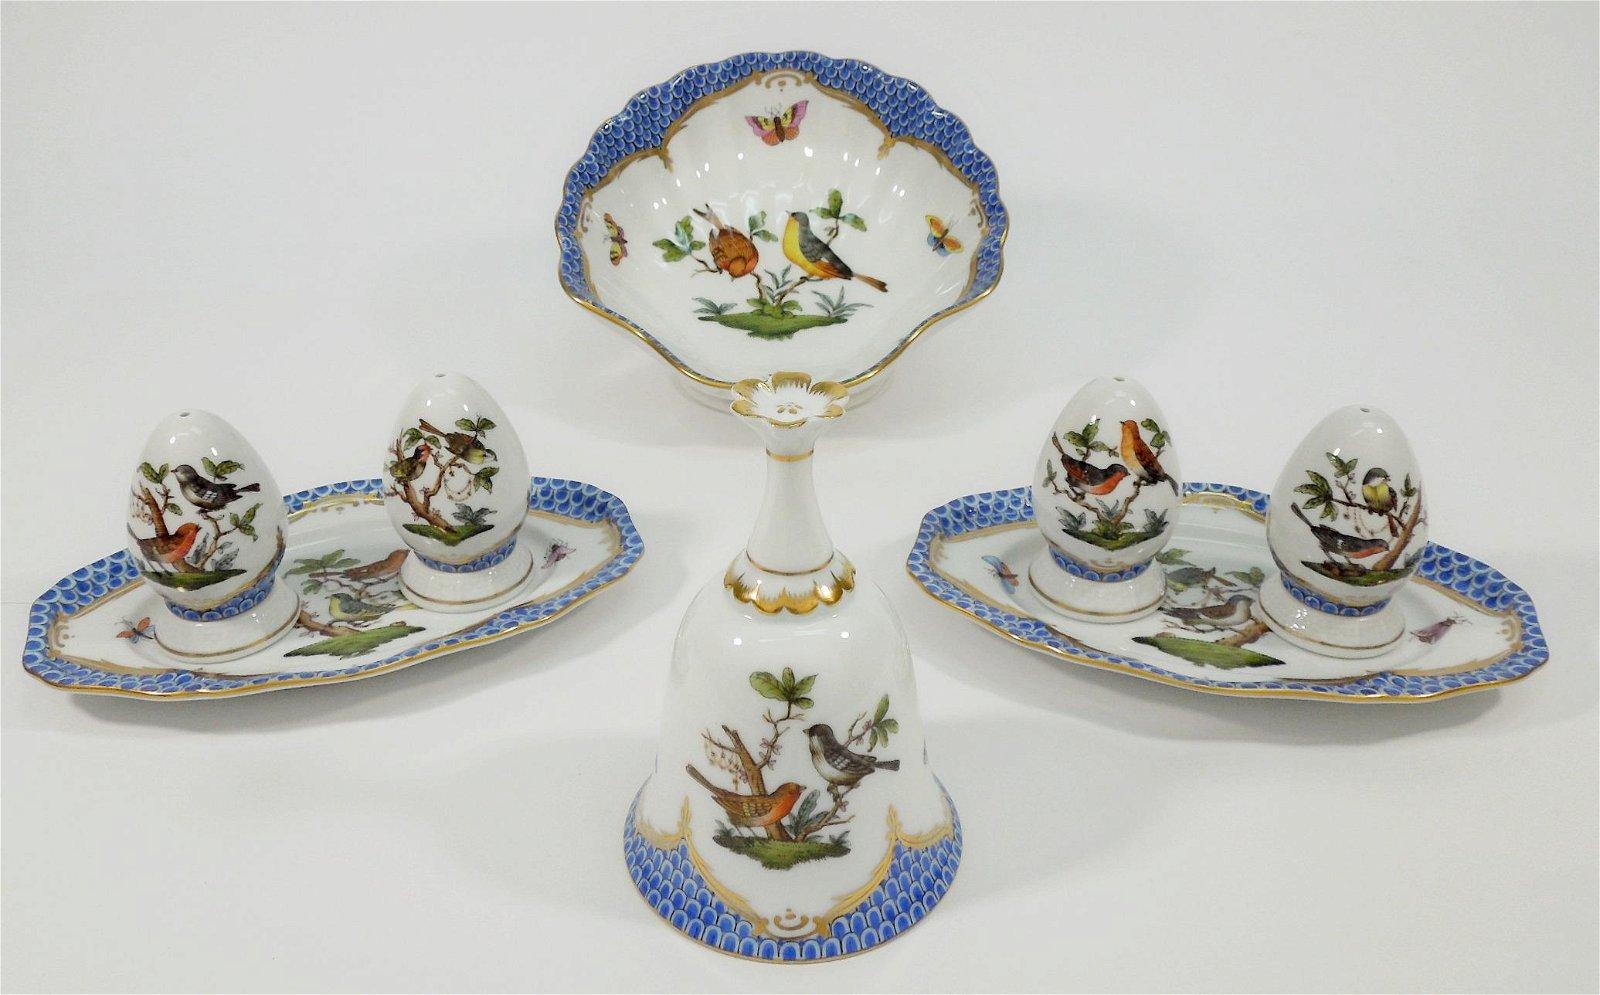 Group of Herend Rothschild Bird Tableware Items.